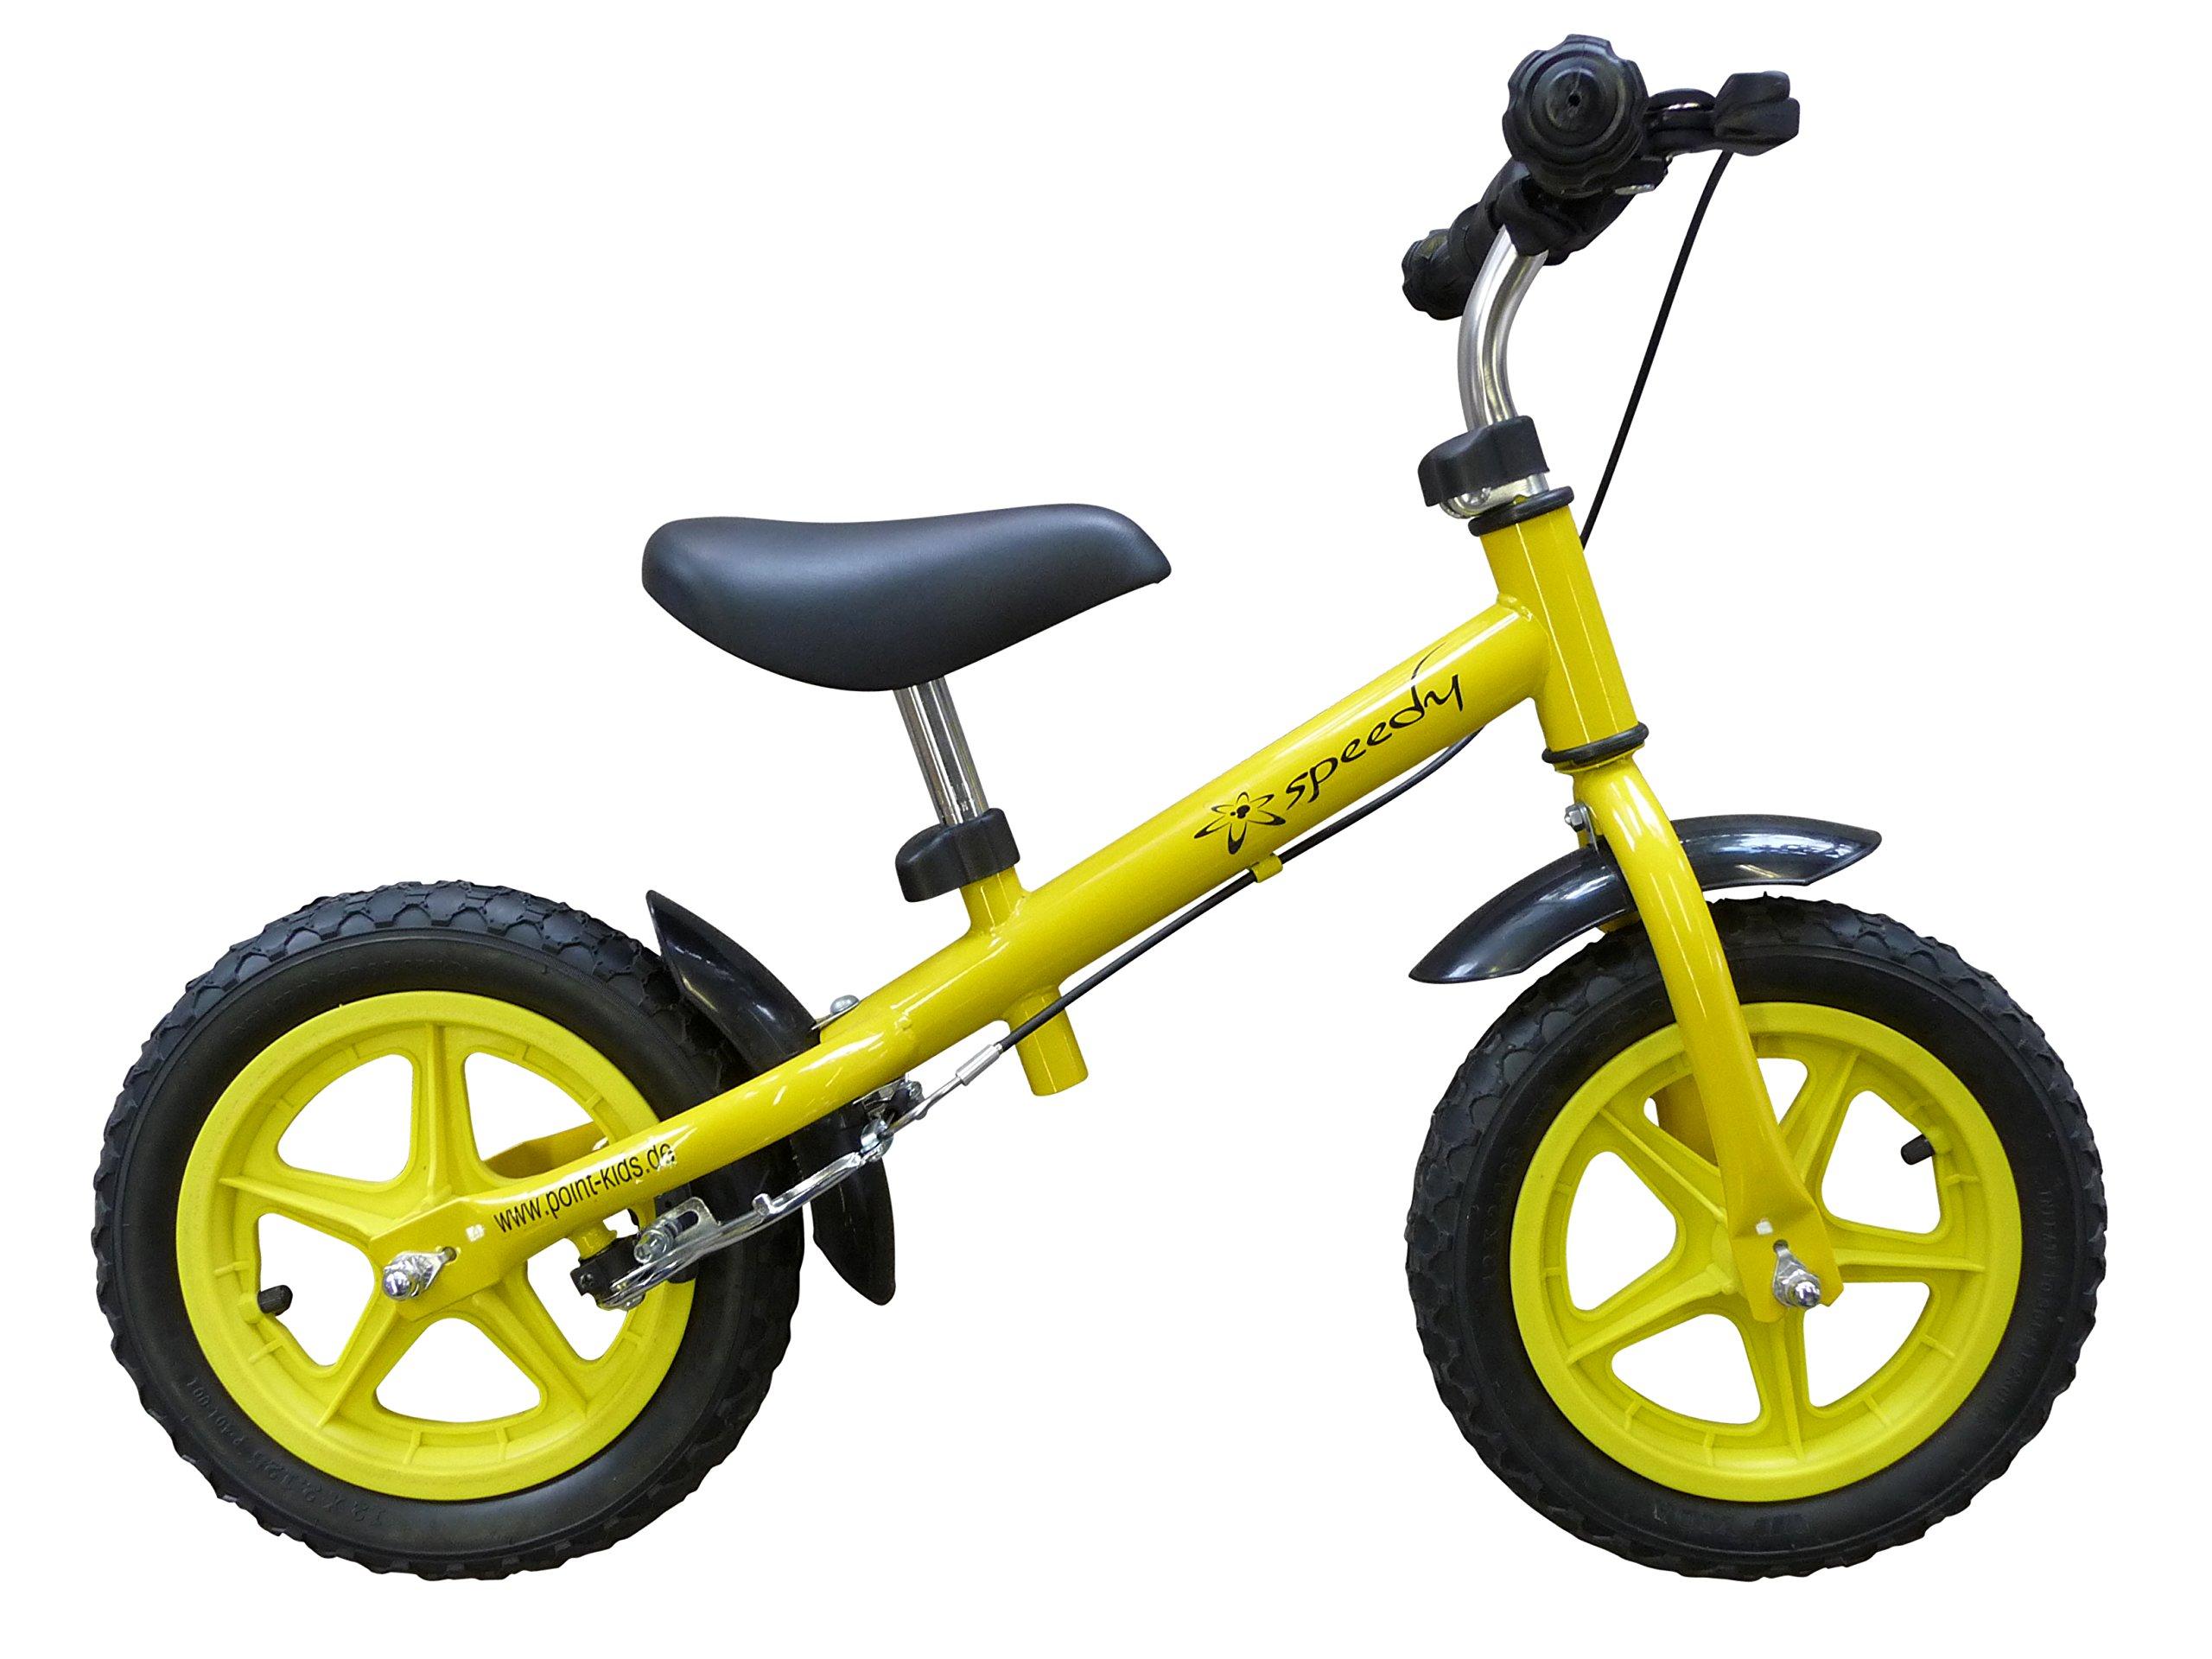 Bicicleta impulso para niños, triciclo 12 Pulgadas, Frenos ...